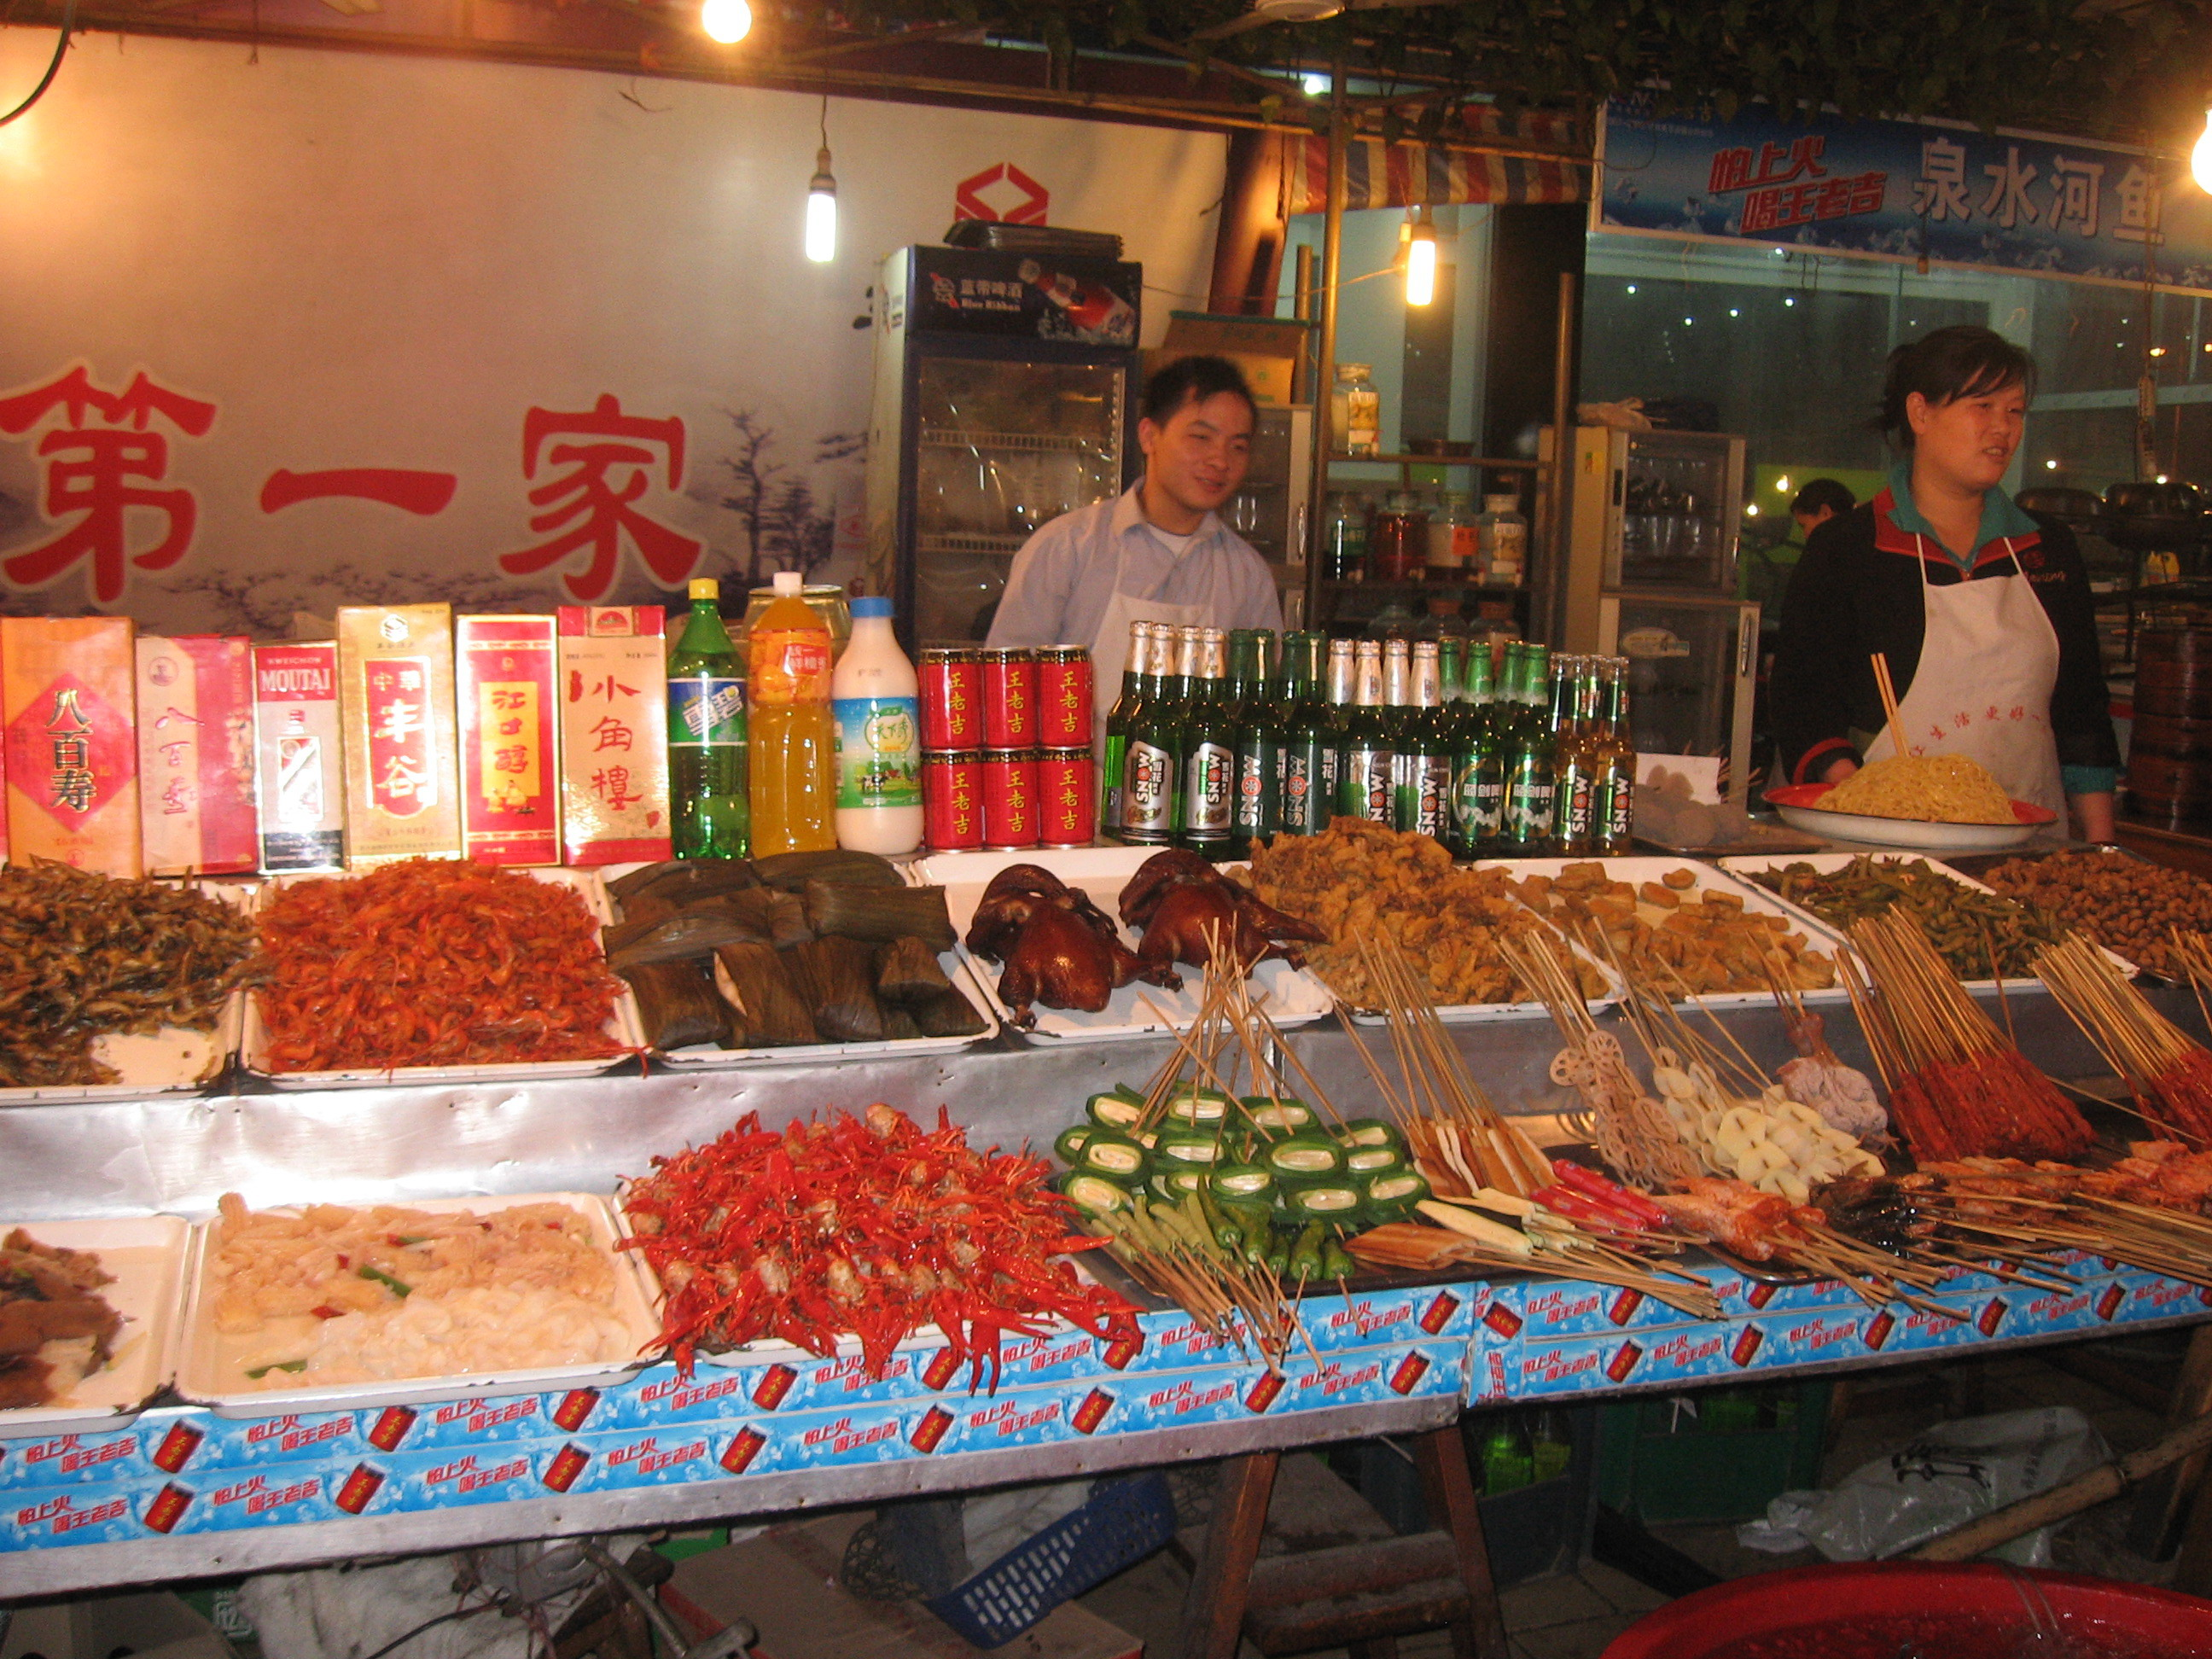 Chinese Food Restaurant In Garfield Nj